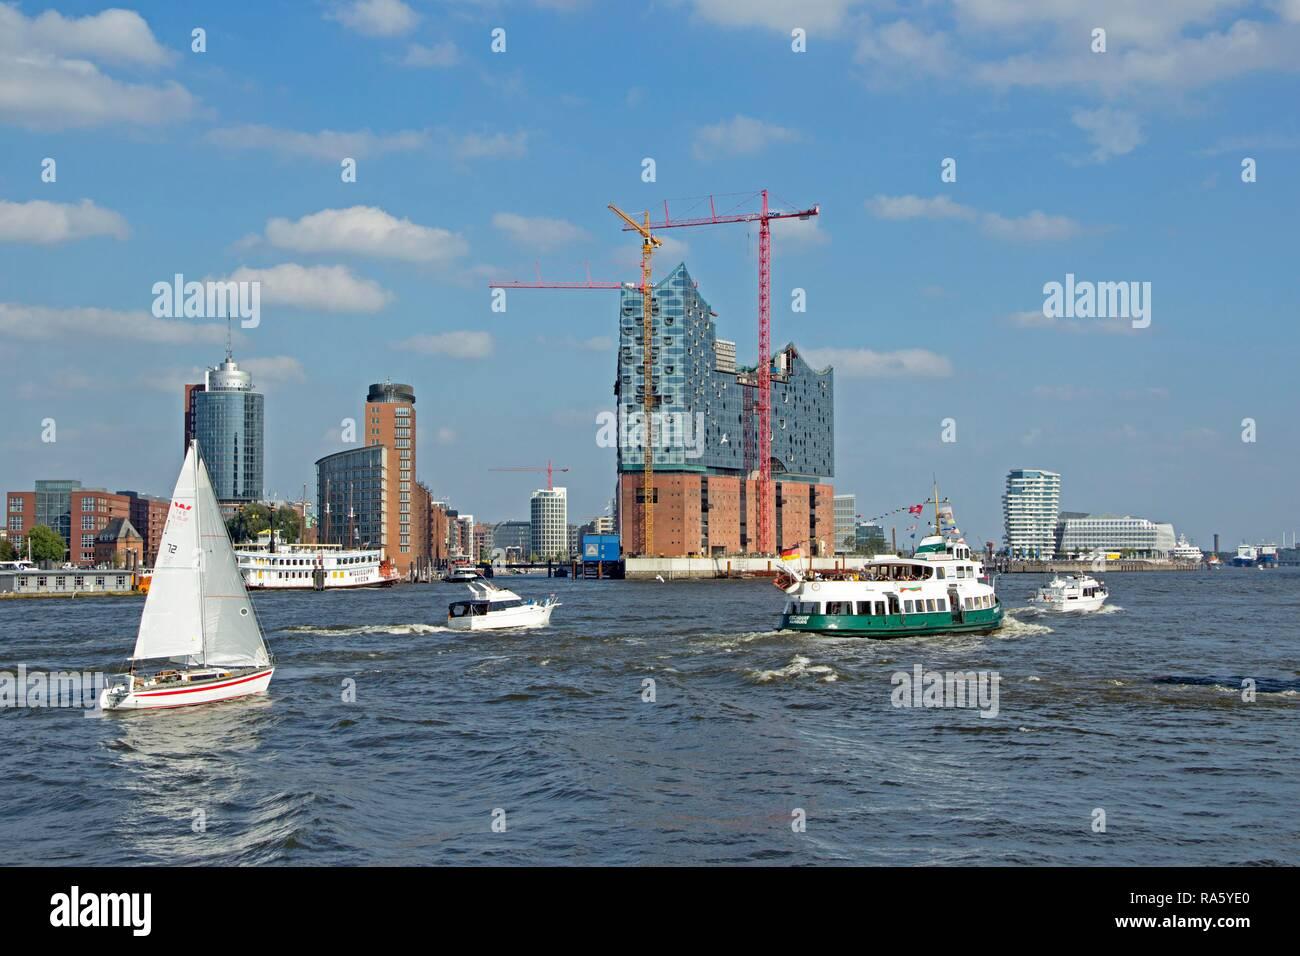 Elbe Philharmonic Hall, Marco Polo Tower and Unilever House, Hamburg - Stock Image